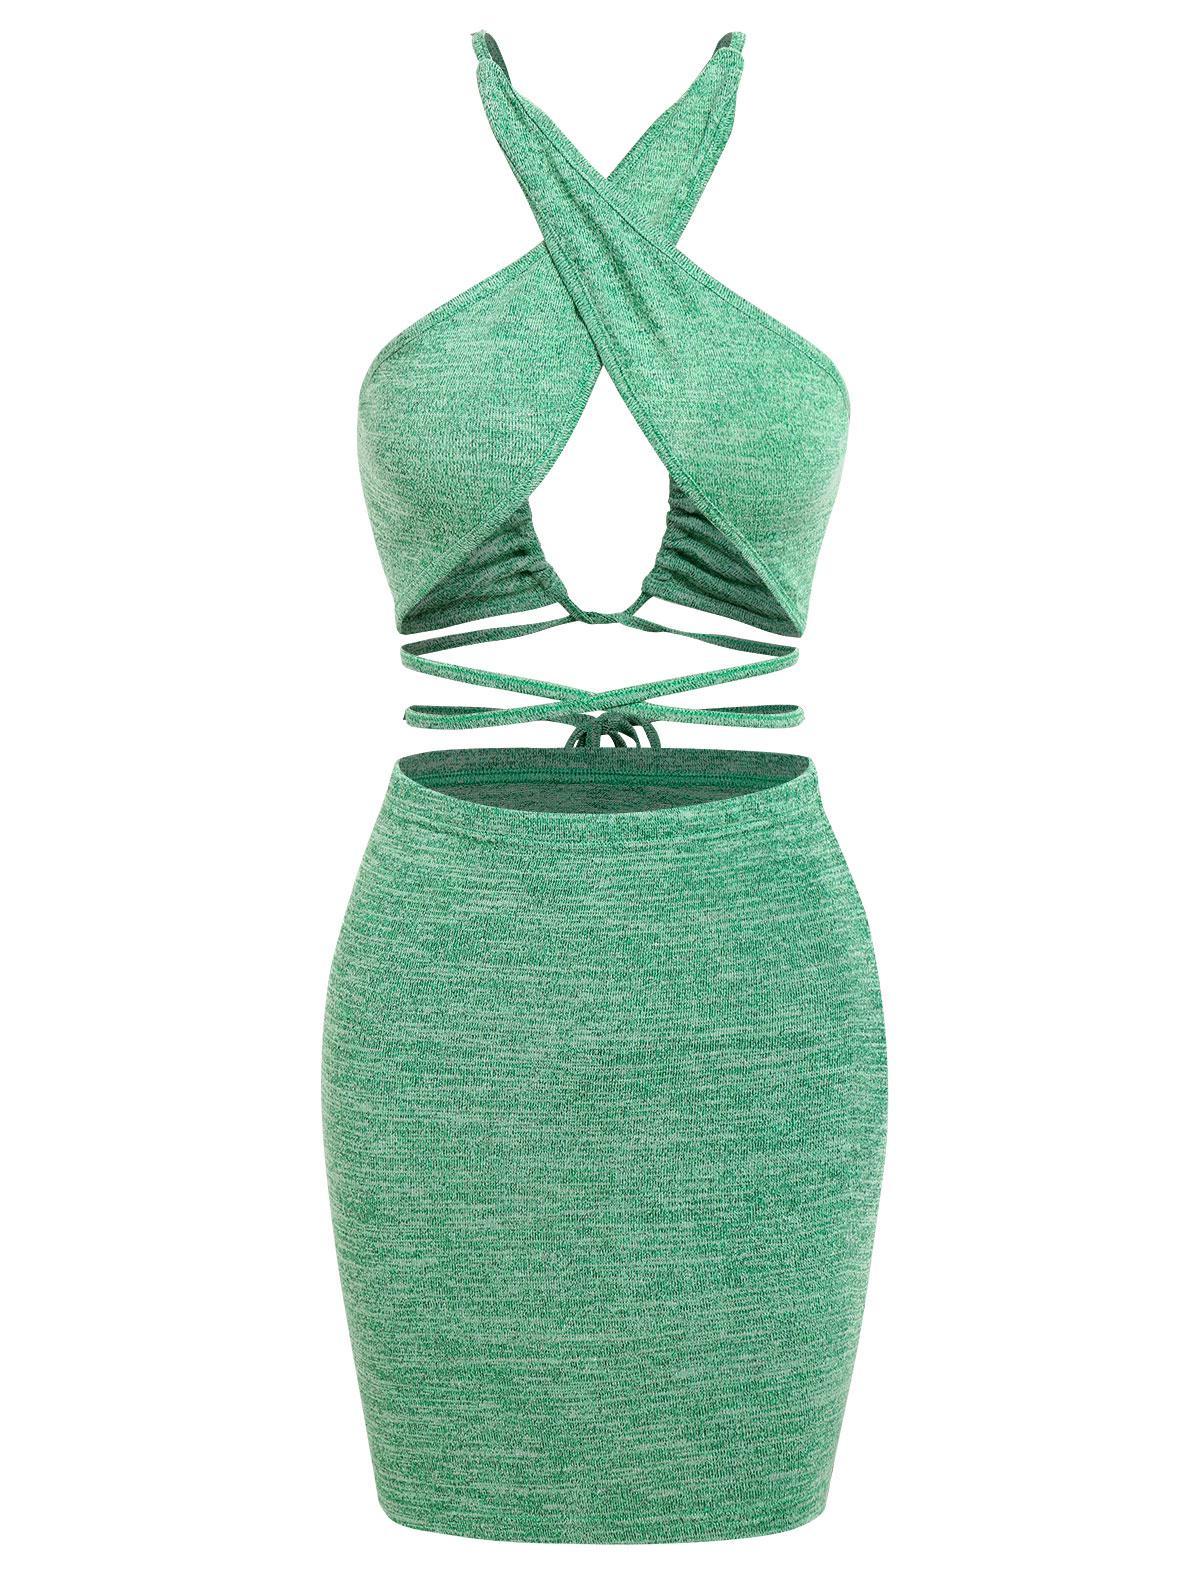 ZAFUL Heather Criss Cross Midriff Flossing Bodycon Skirt Set